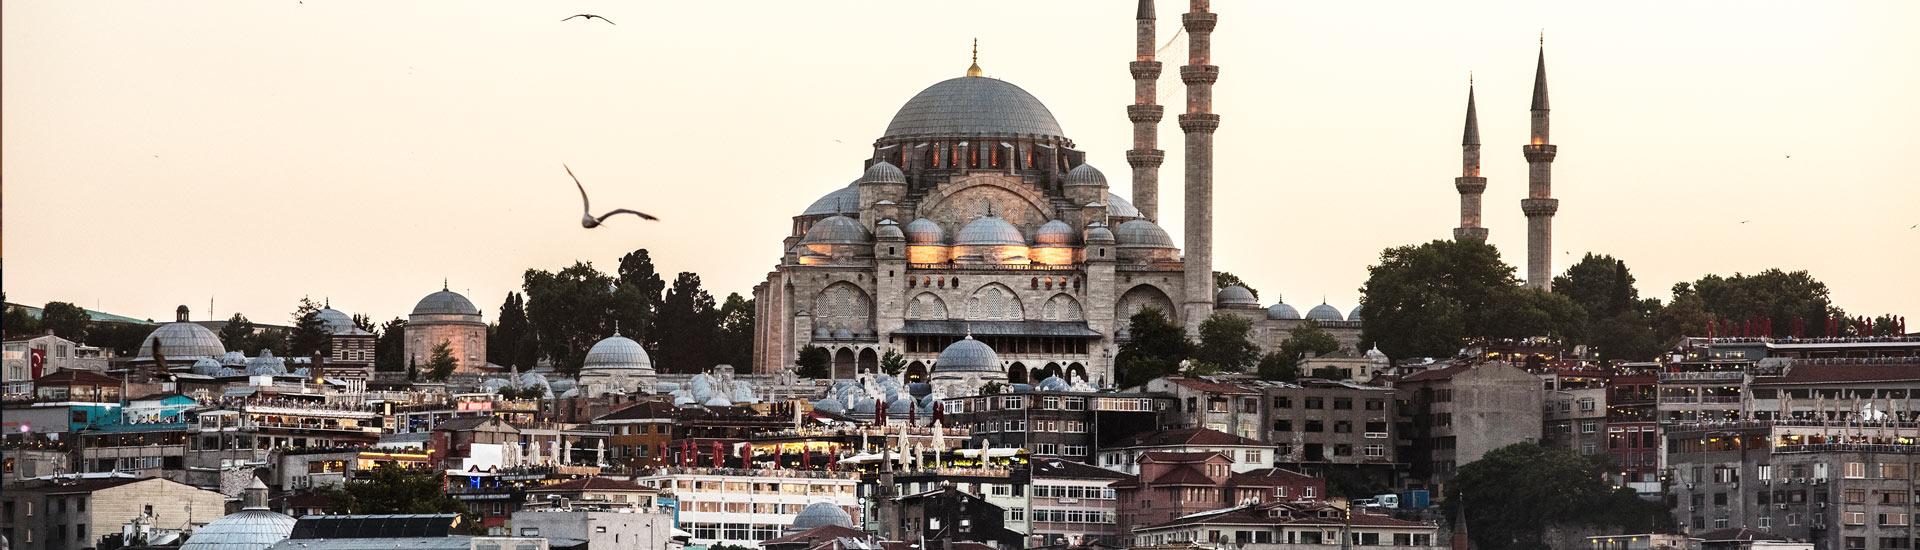 Spedition Logistikunternehmen Türkei